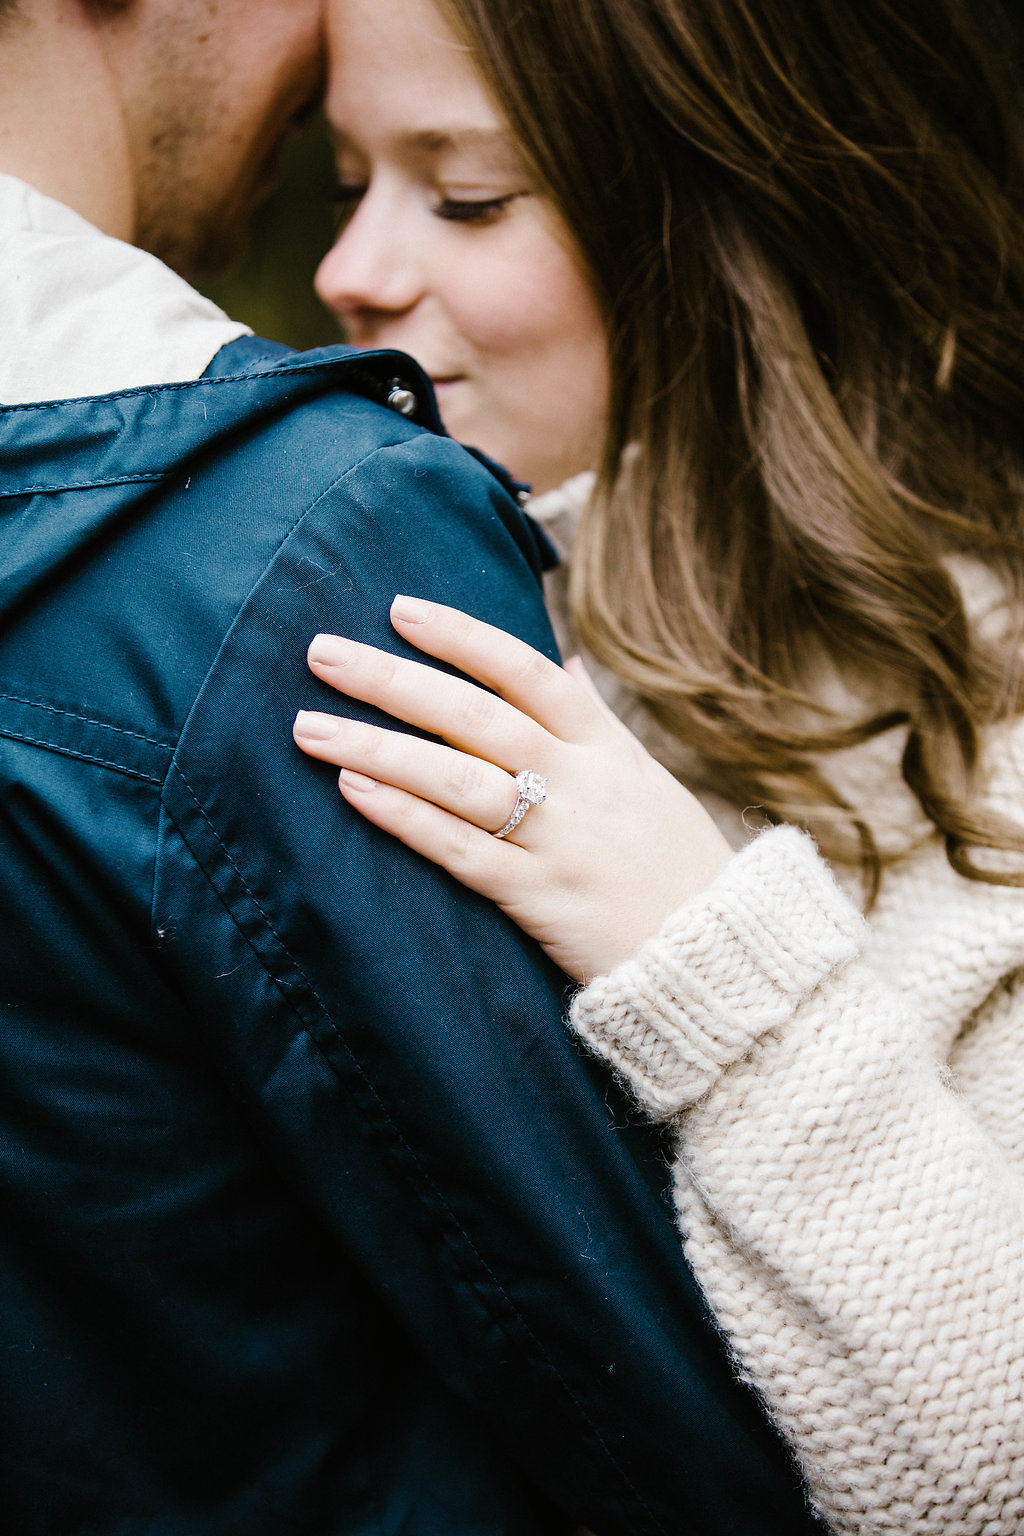 lexi-joey-pioneer-square-engagement-by-Seattle-Wedding-Photographer-Adina-Preston-32.JPG